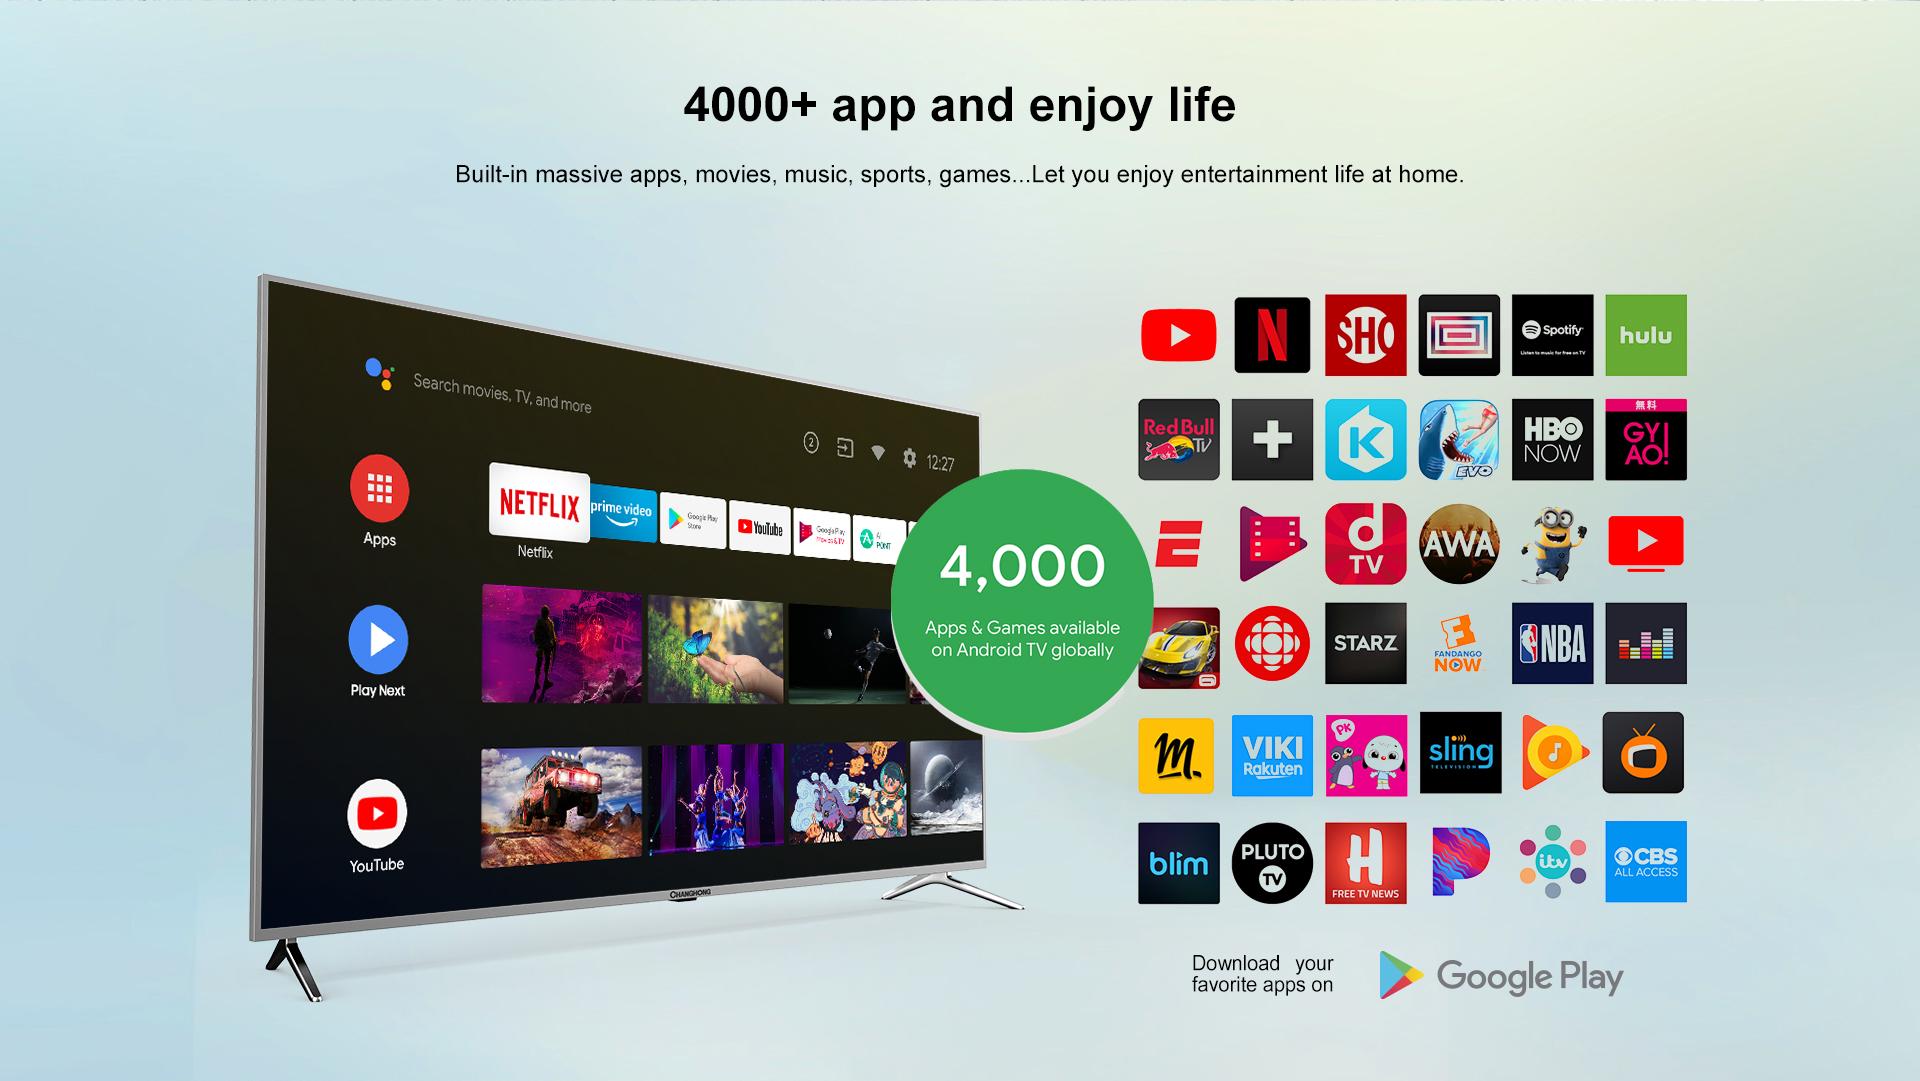 Changhong 58 Inch 4K UHD - Android 9.0 TV - google Certified - Netflix Digital LED Big Inch TV - WiFi (Model : U58H7A) Garansi Resmi 3